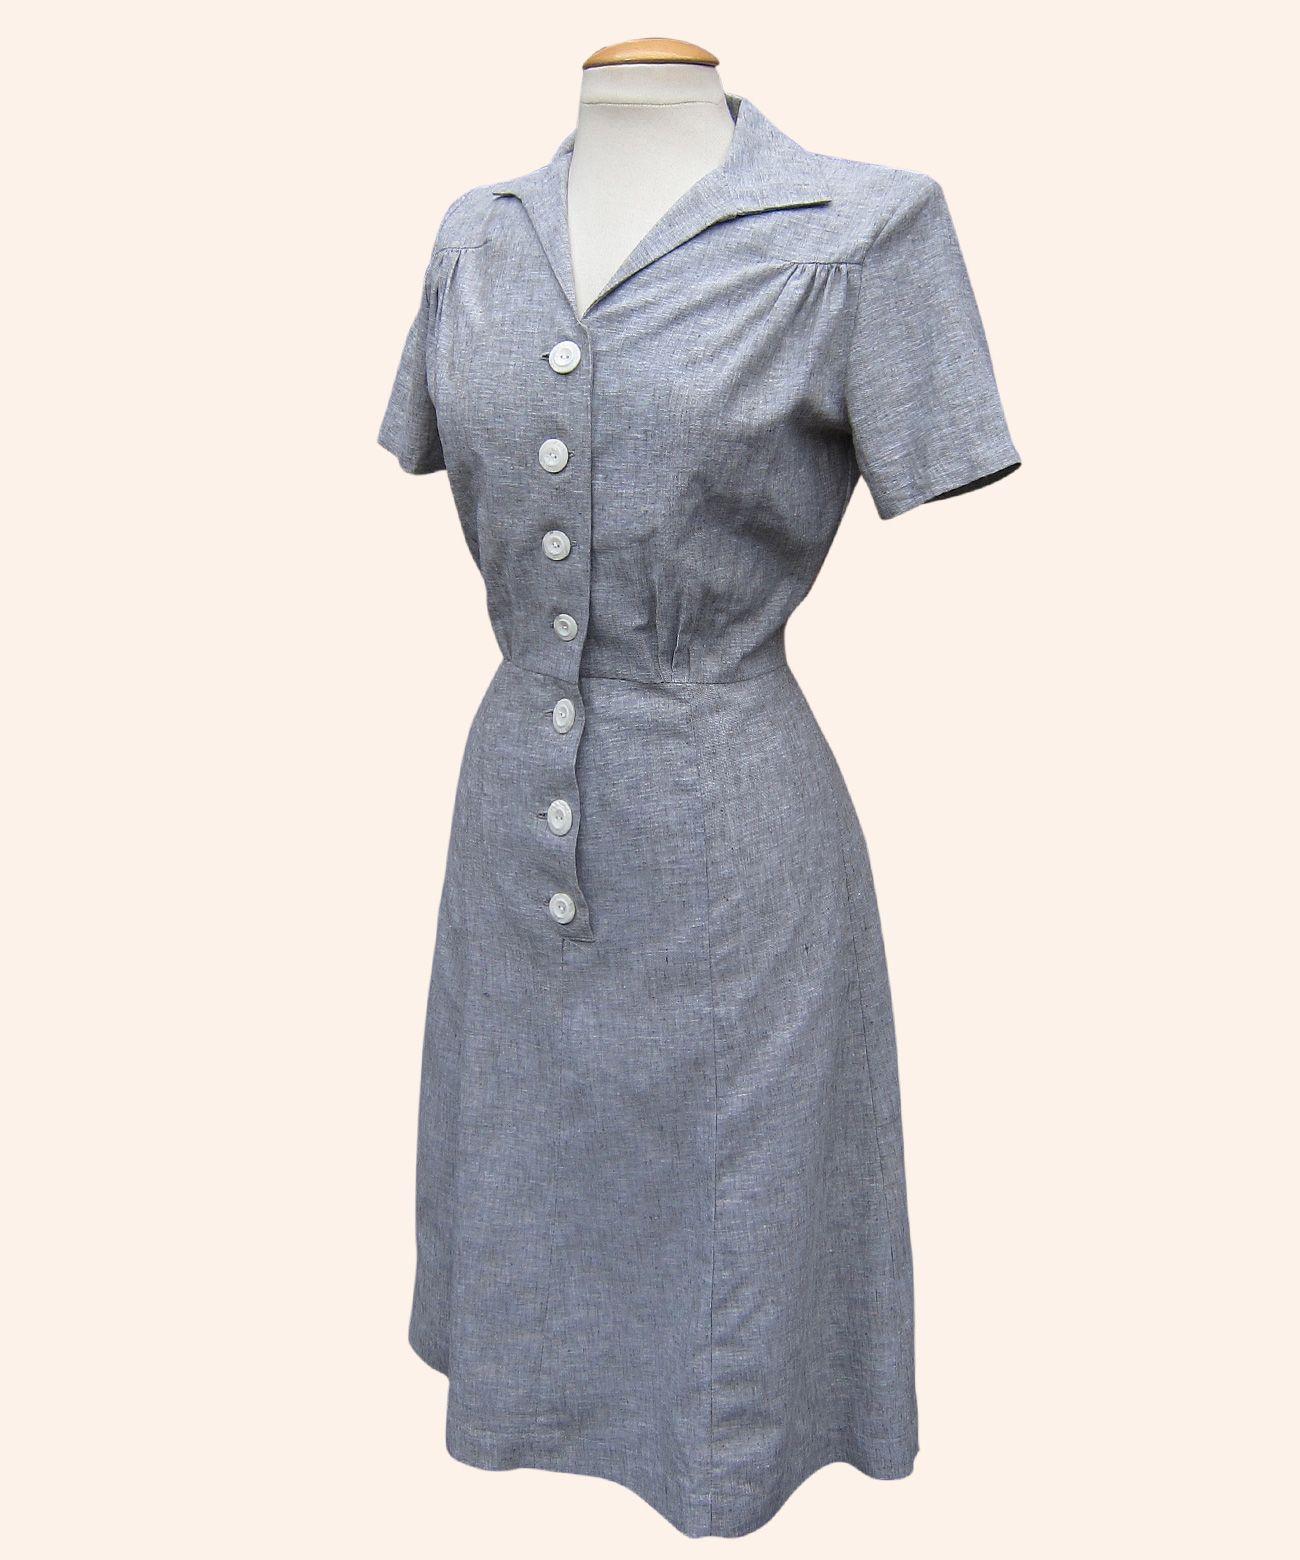 Tea Day Dress in Utility Grey